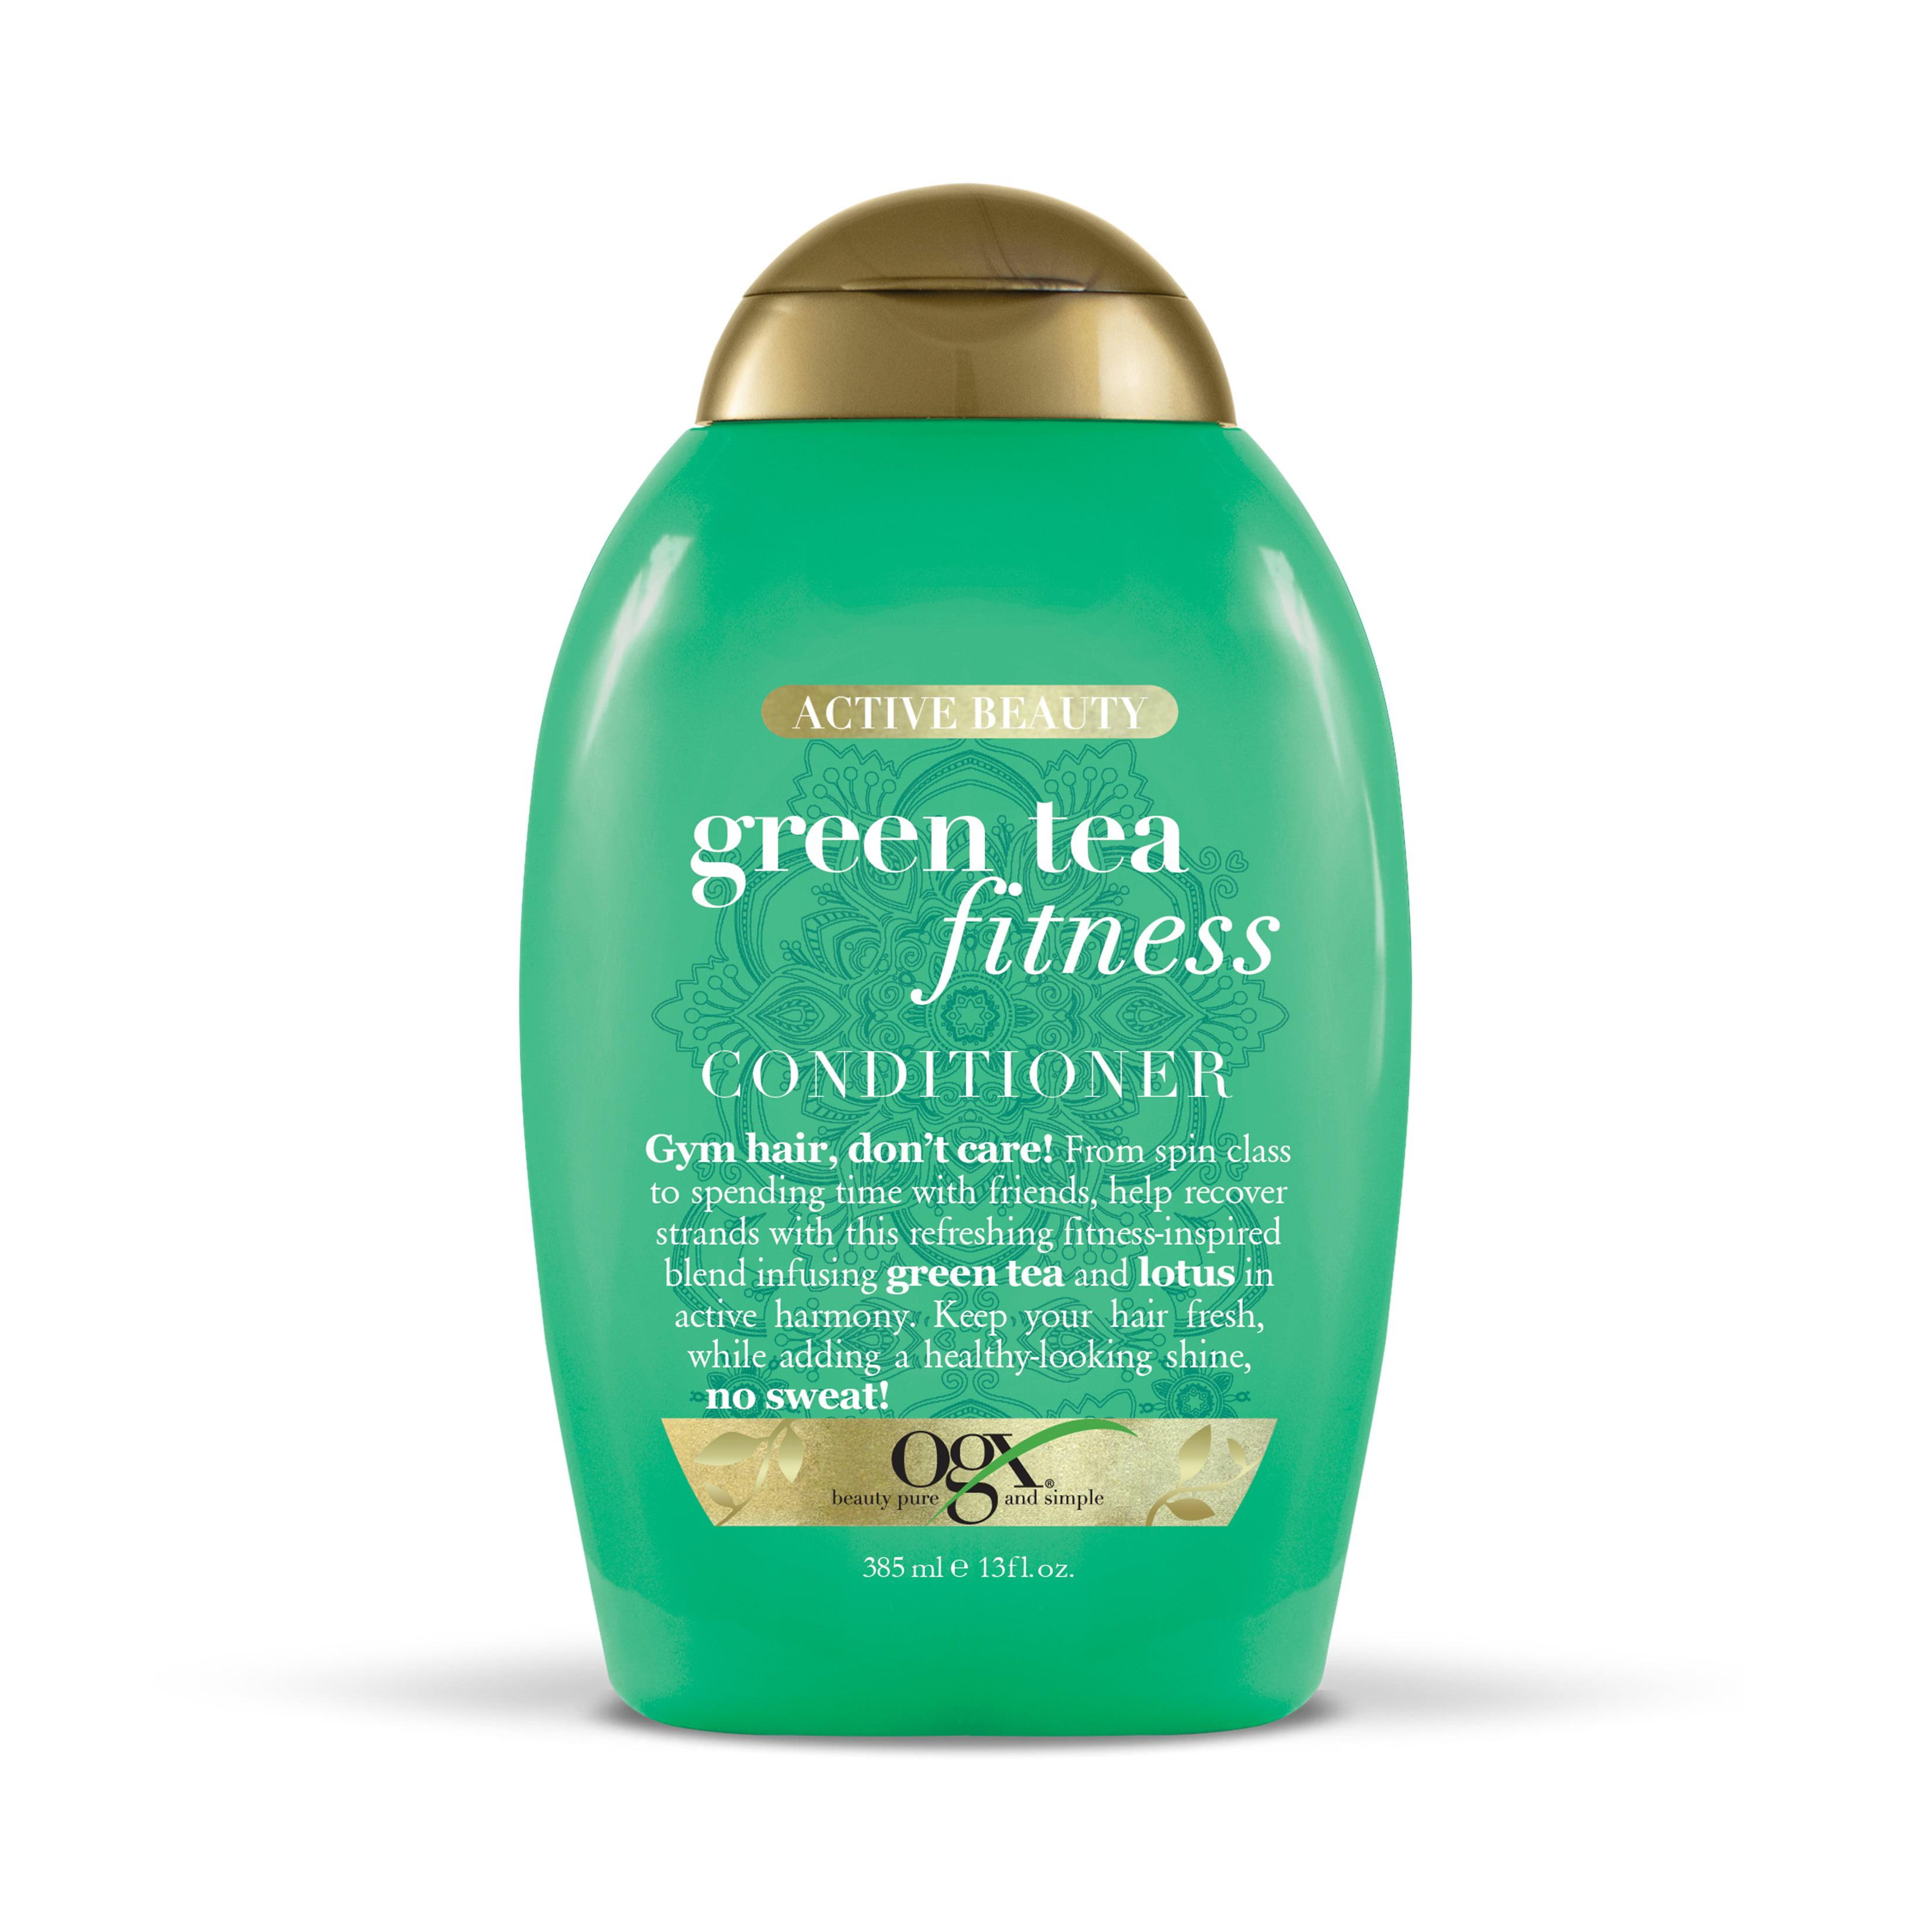 OGX Active Beauty Green Tea Fitness Conditioner, 13 oz